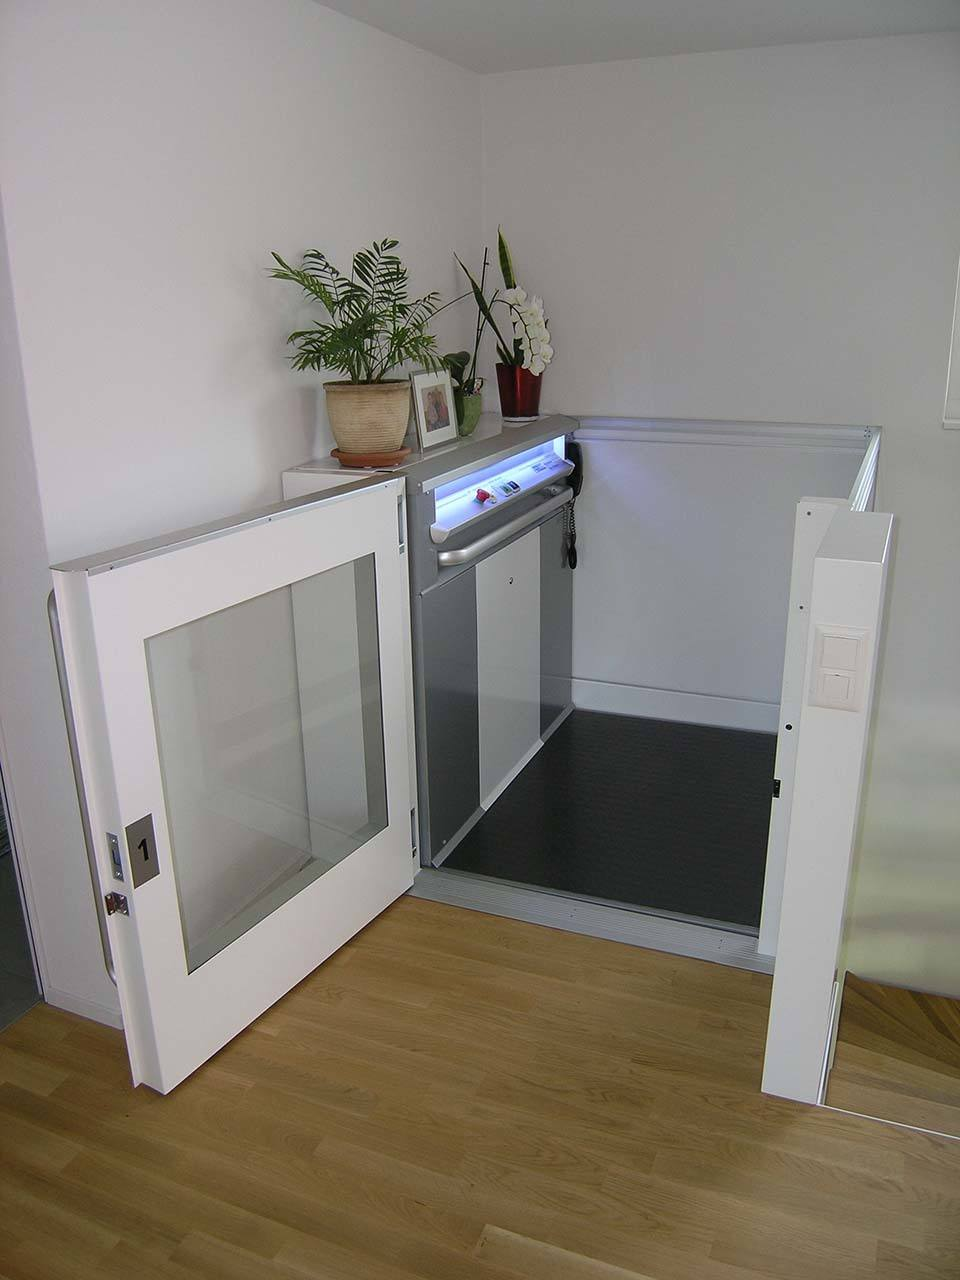 Homelift ohne Dachaufbau in Einfamilienhaus Neubau